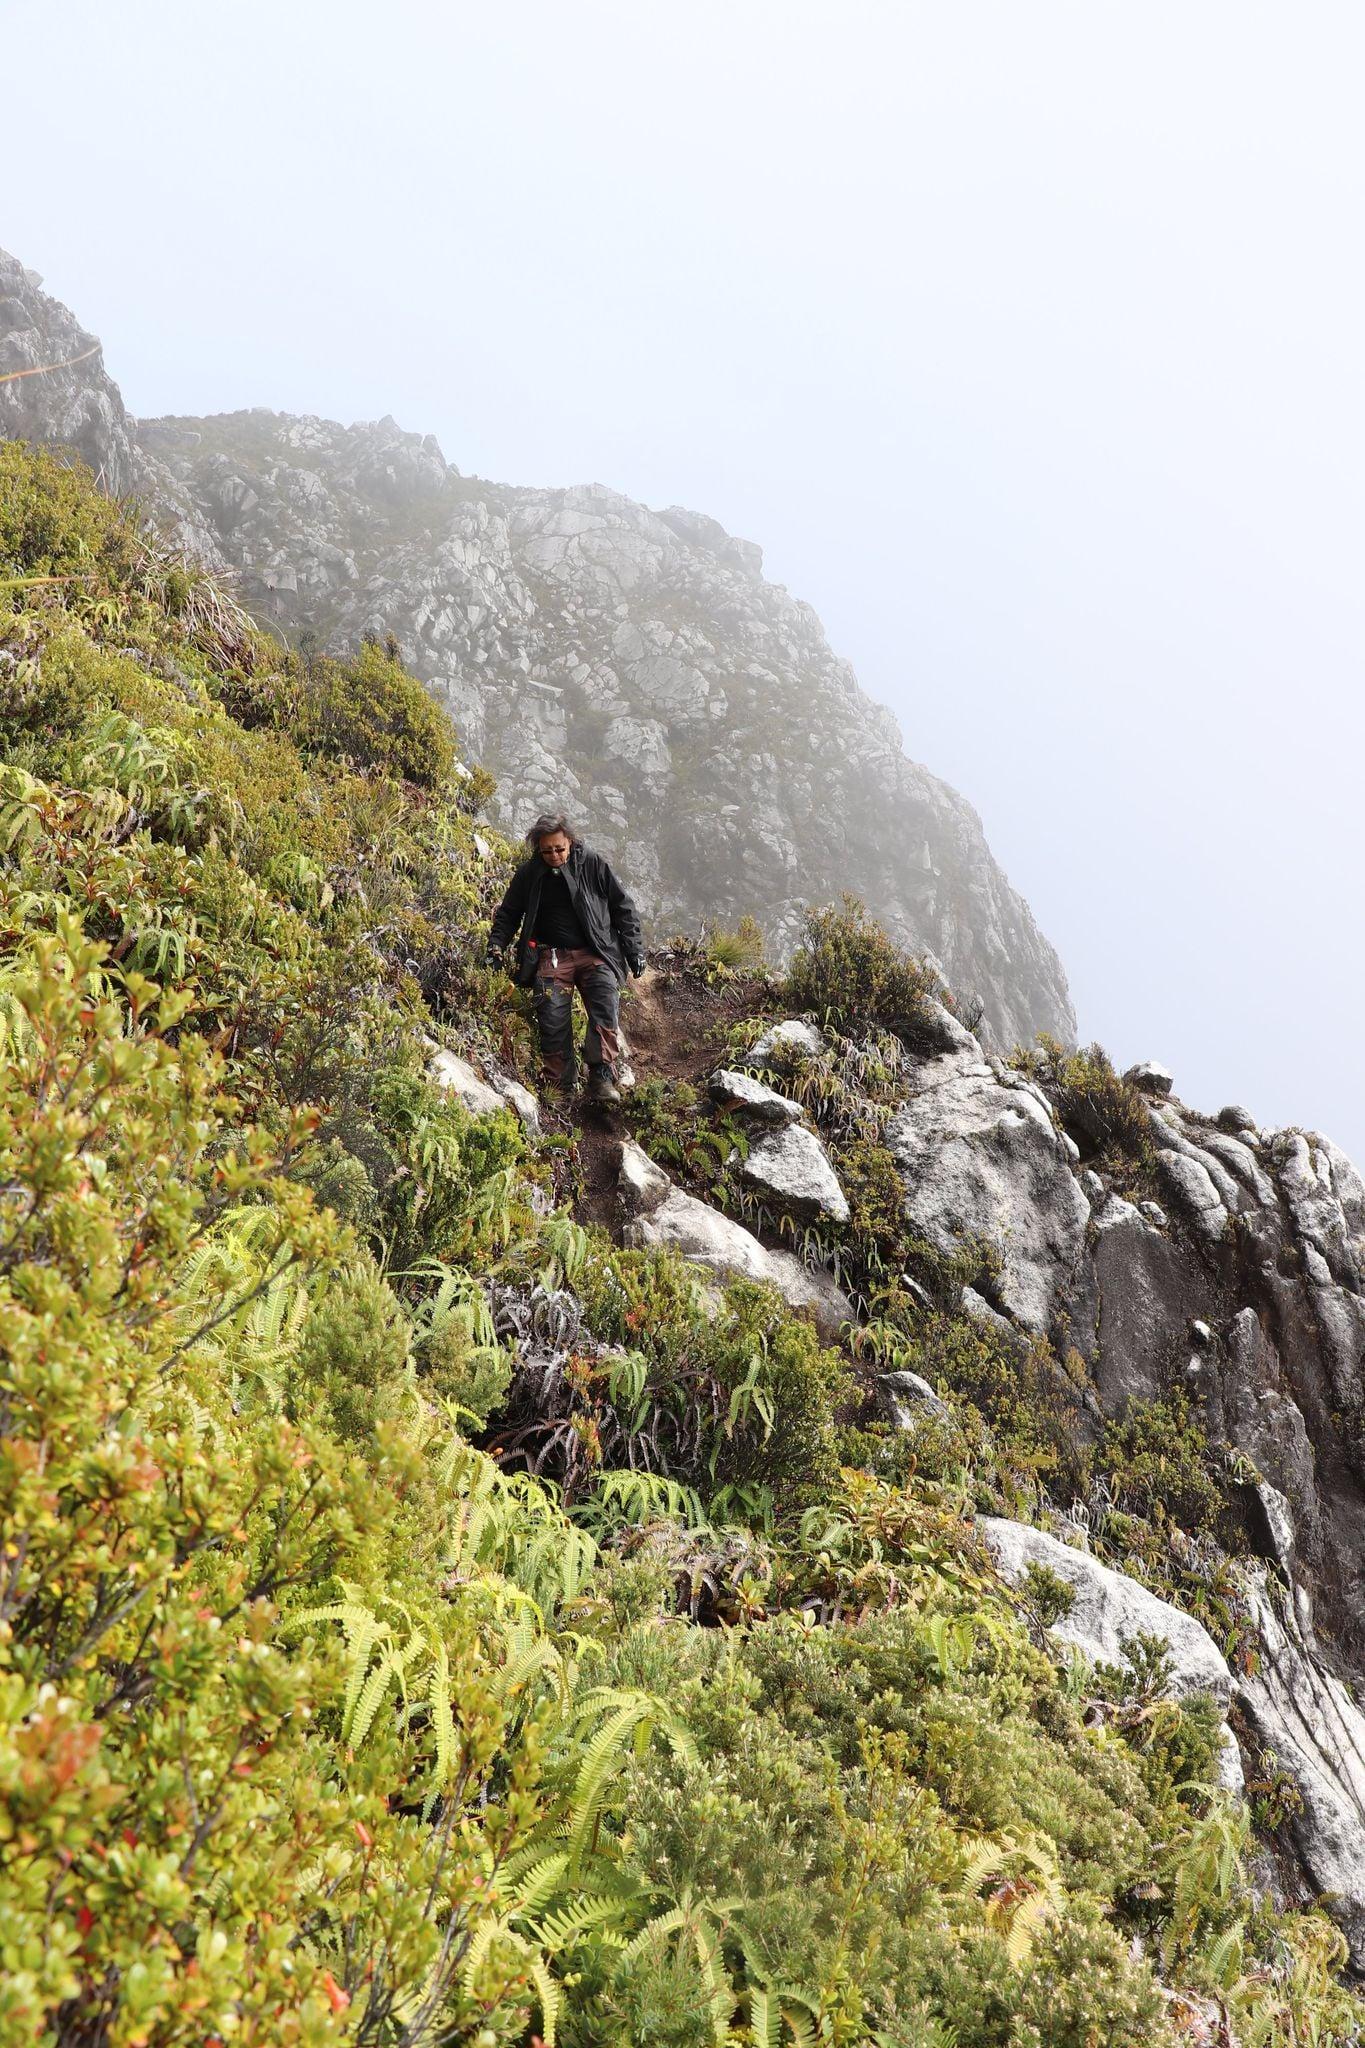 Trekkers Hikers Climbing Mt. Apo